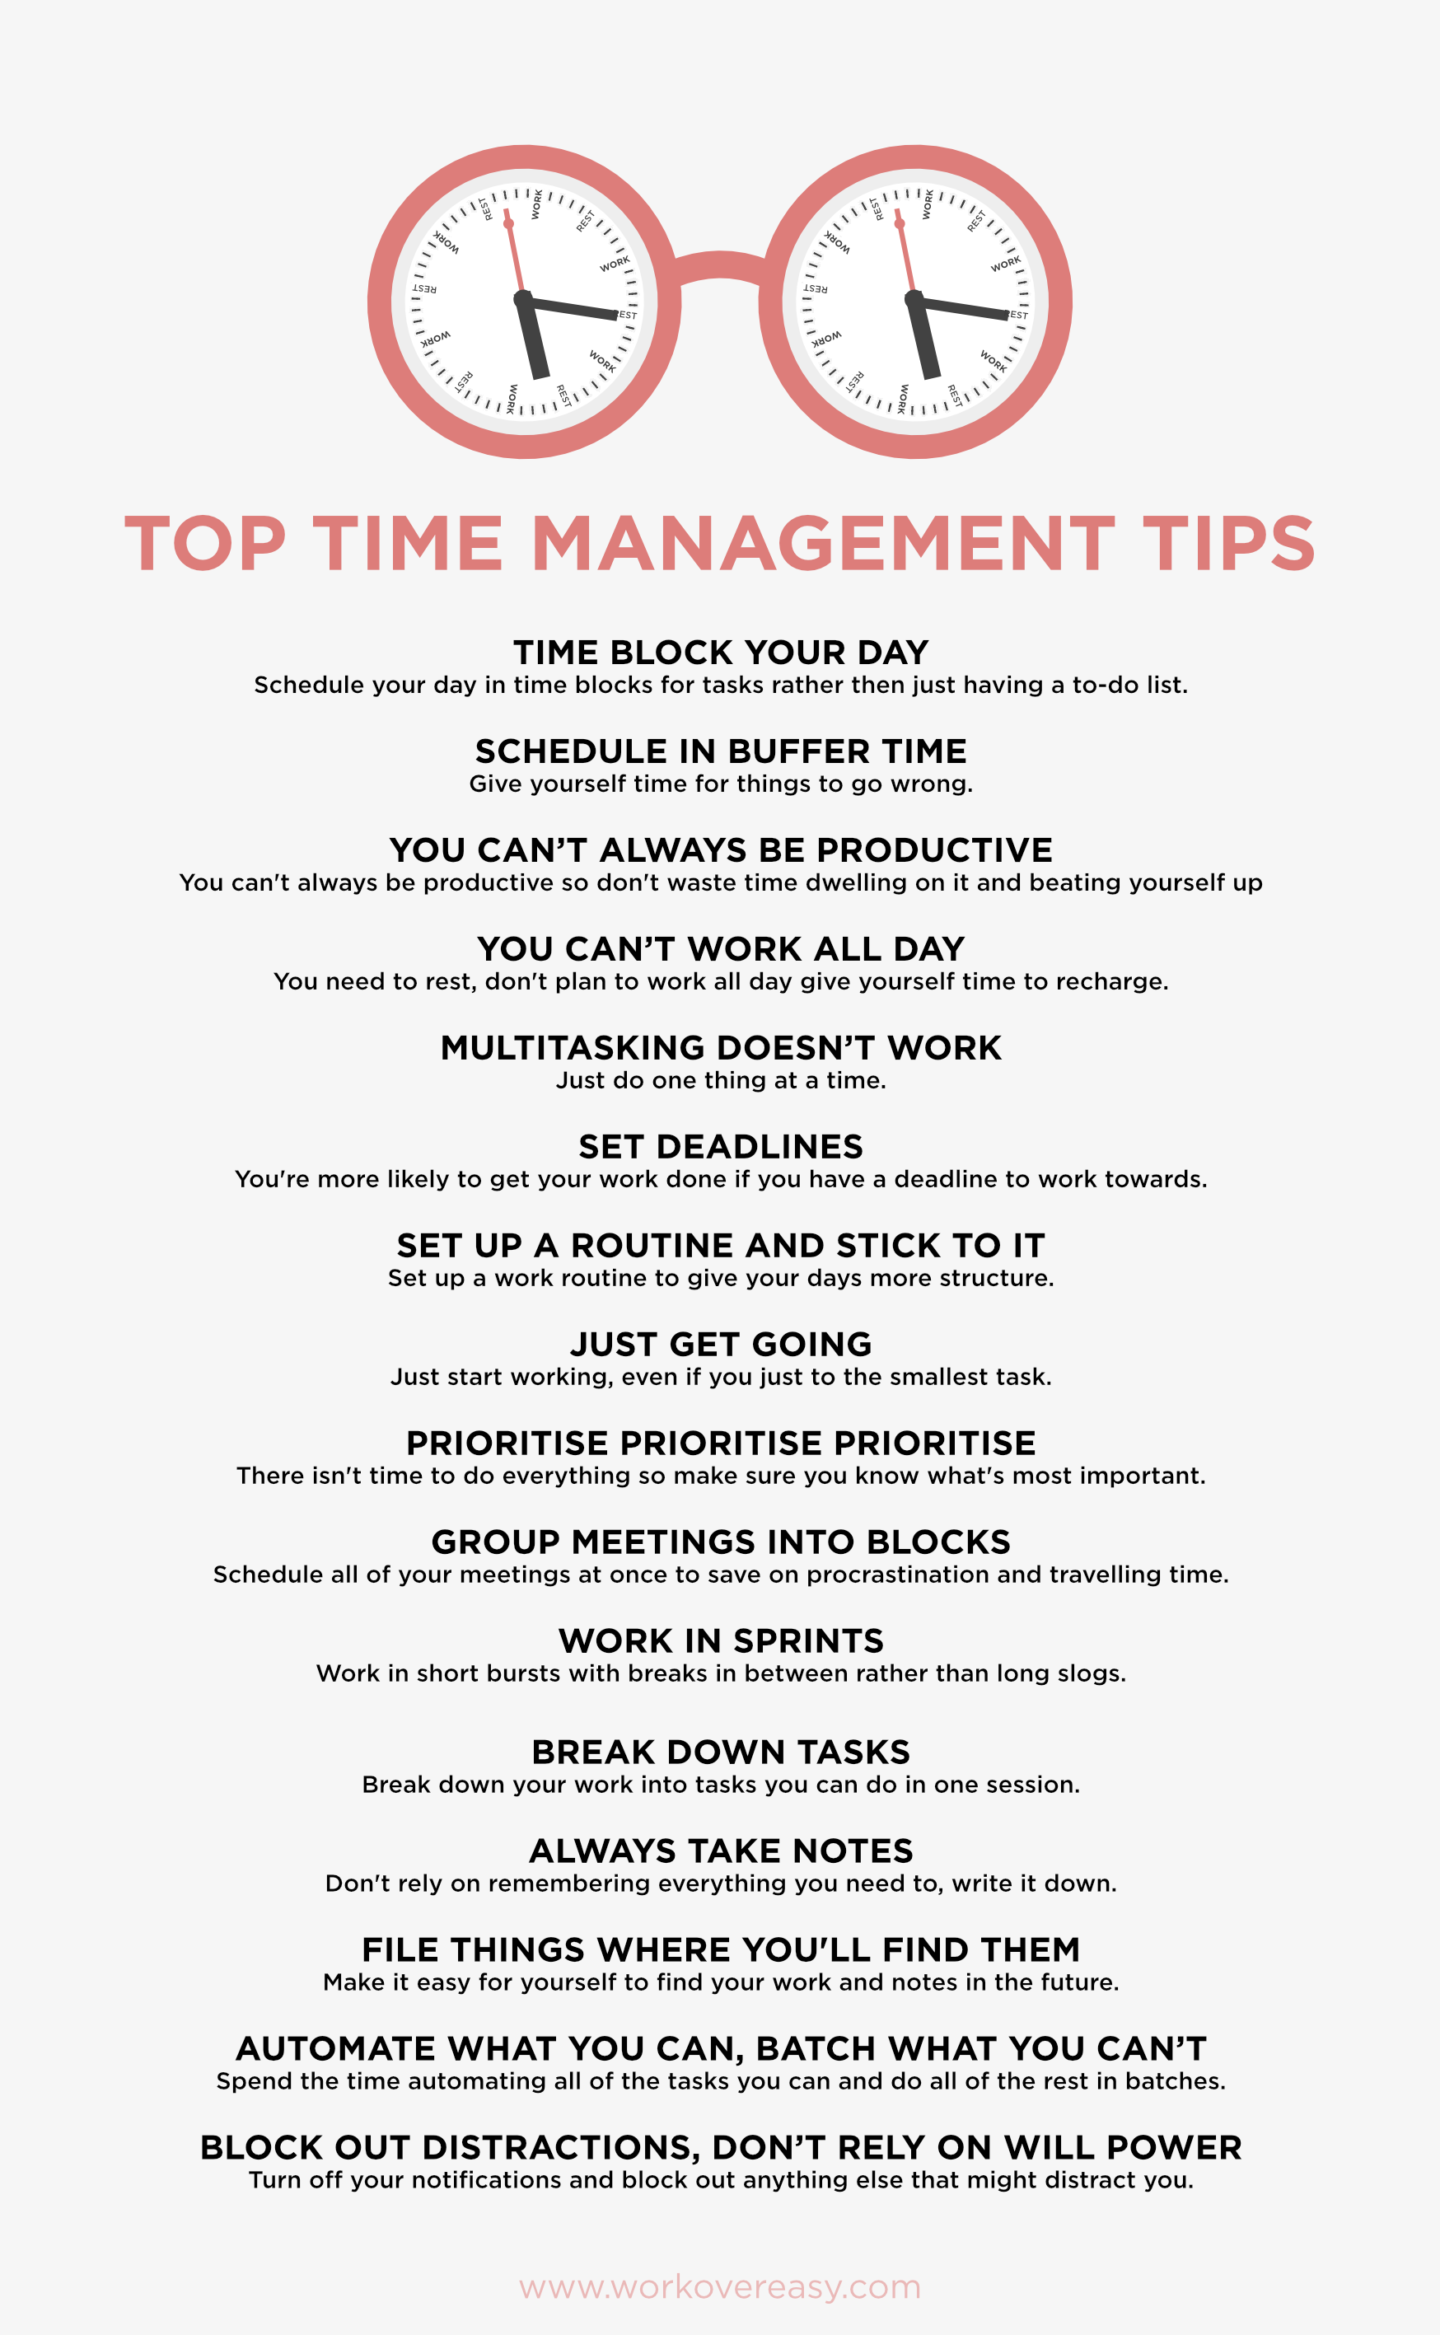 10 Terrific Time Management Tips - BrandonGaille.com  Time Management Tips